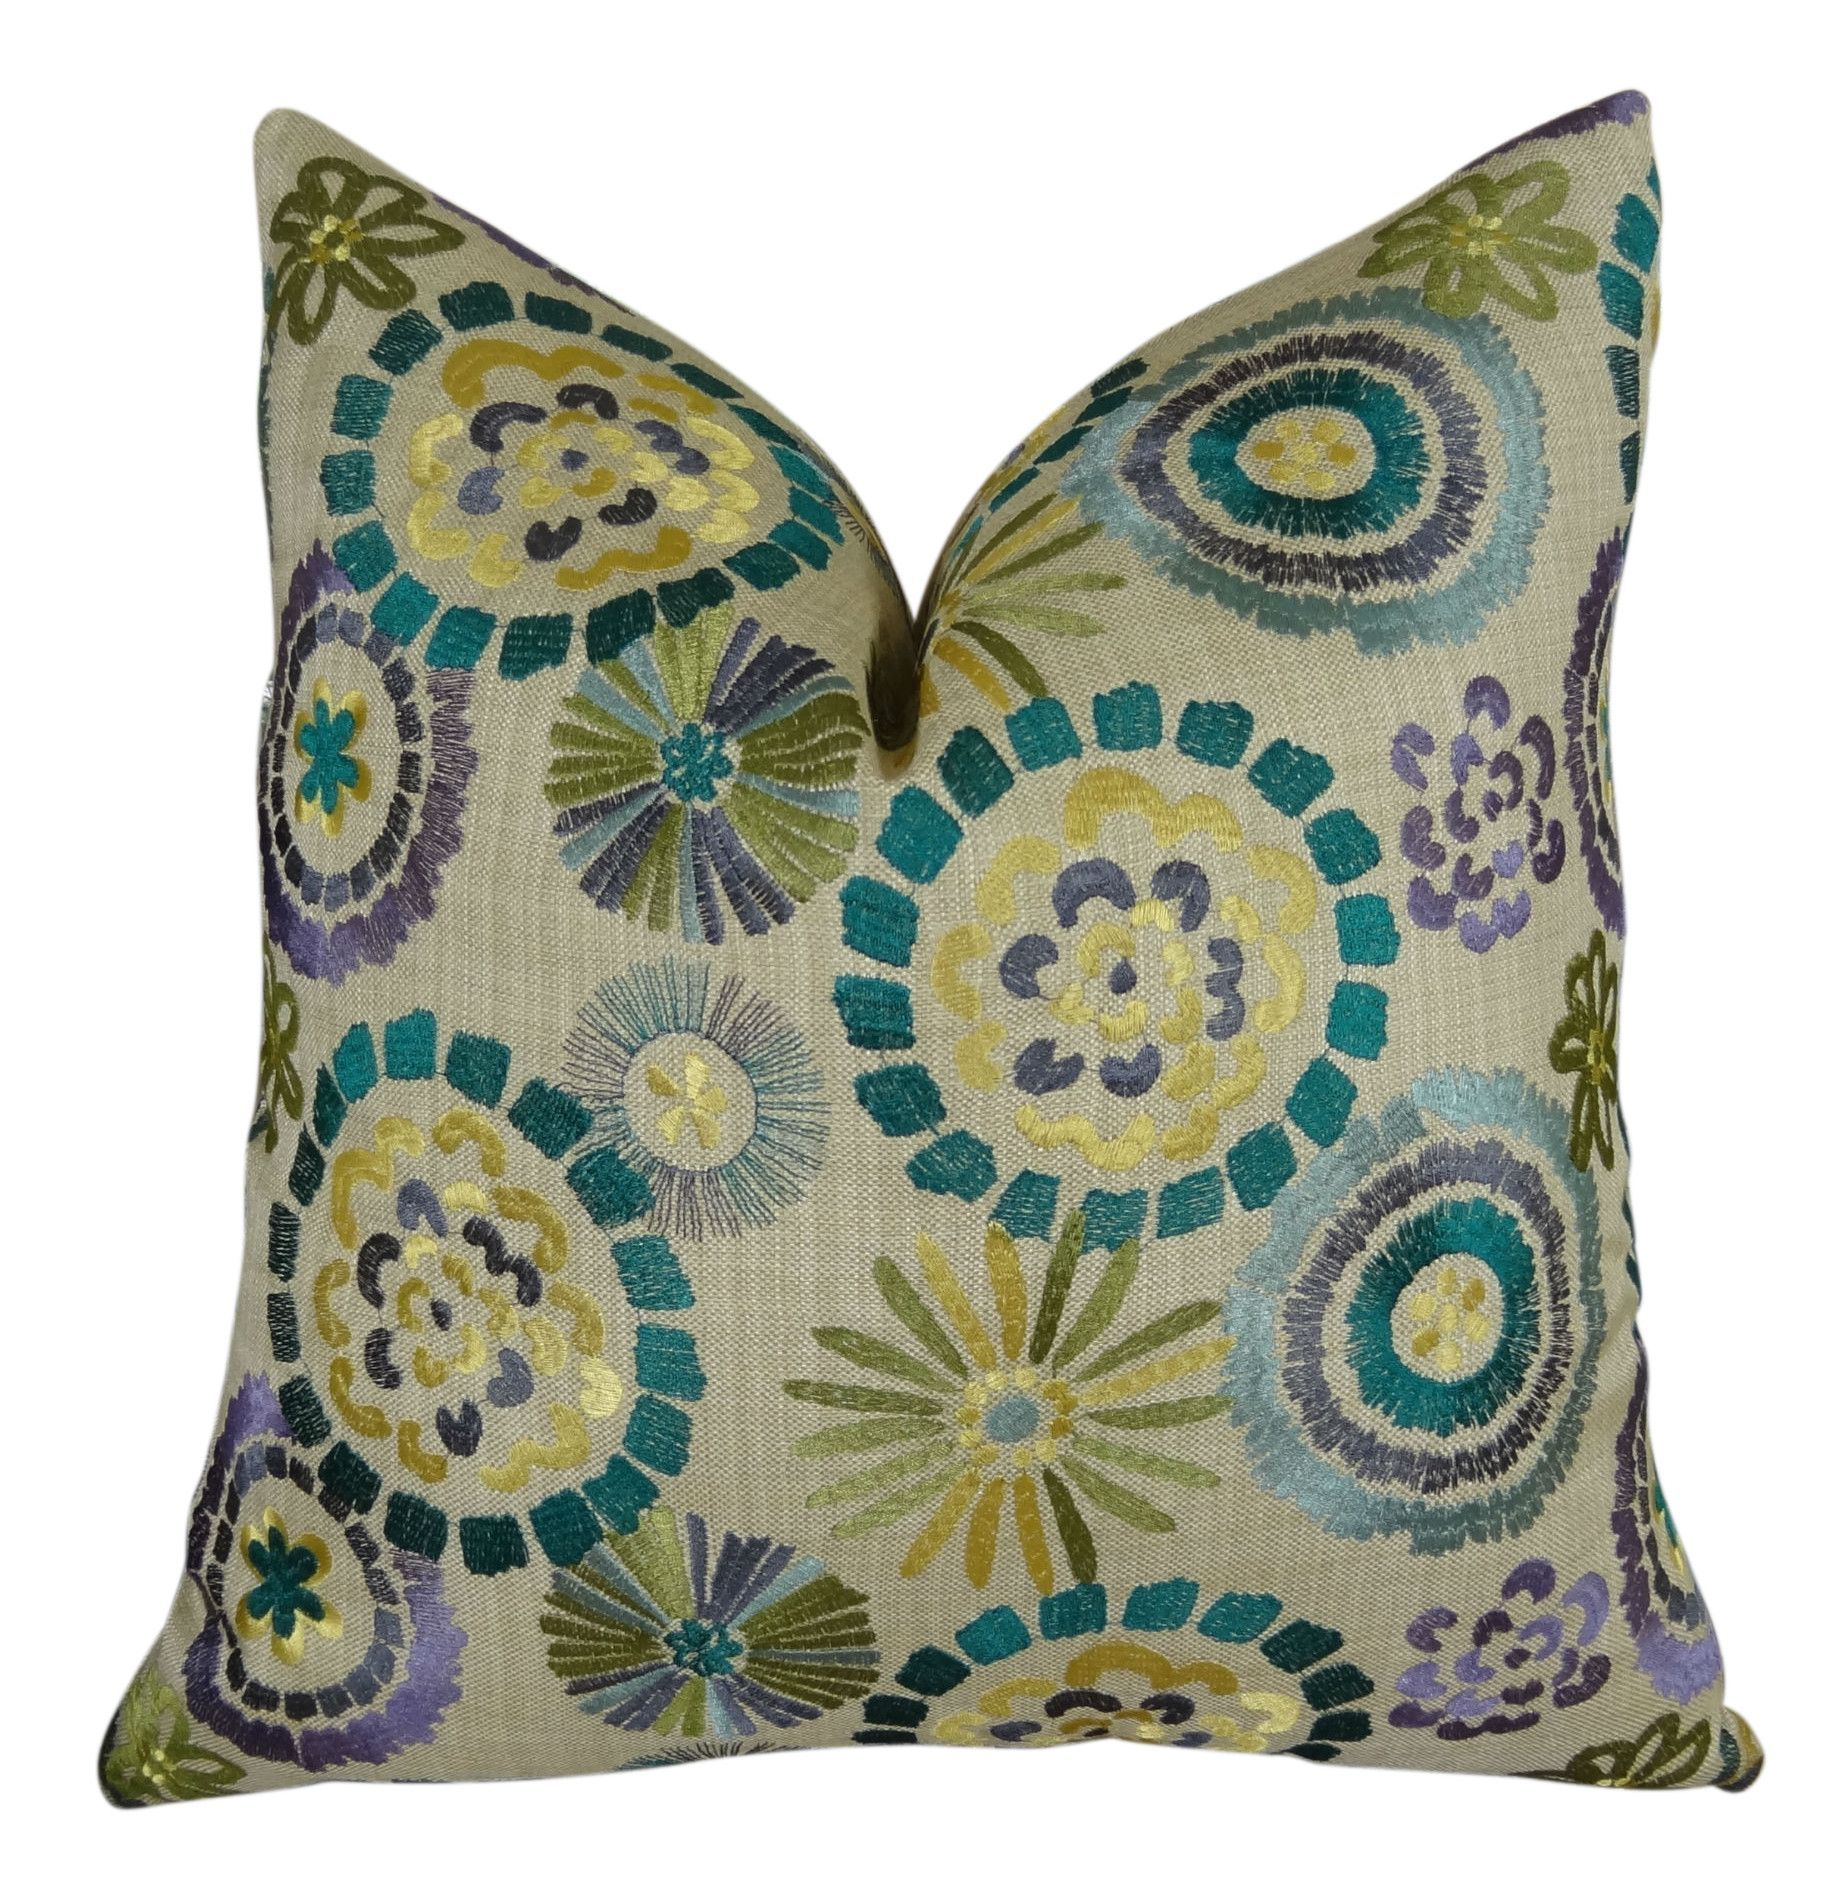 Lyford bluegreen throw pillow throw pillows pillows and products